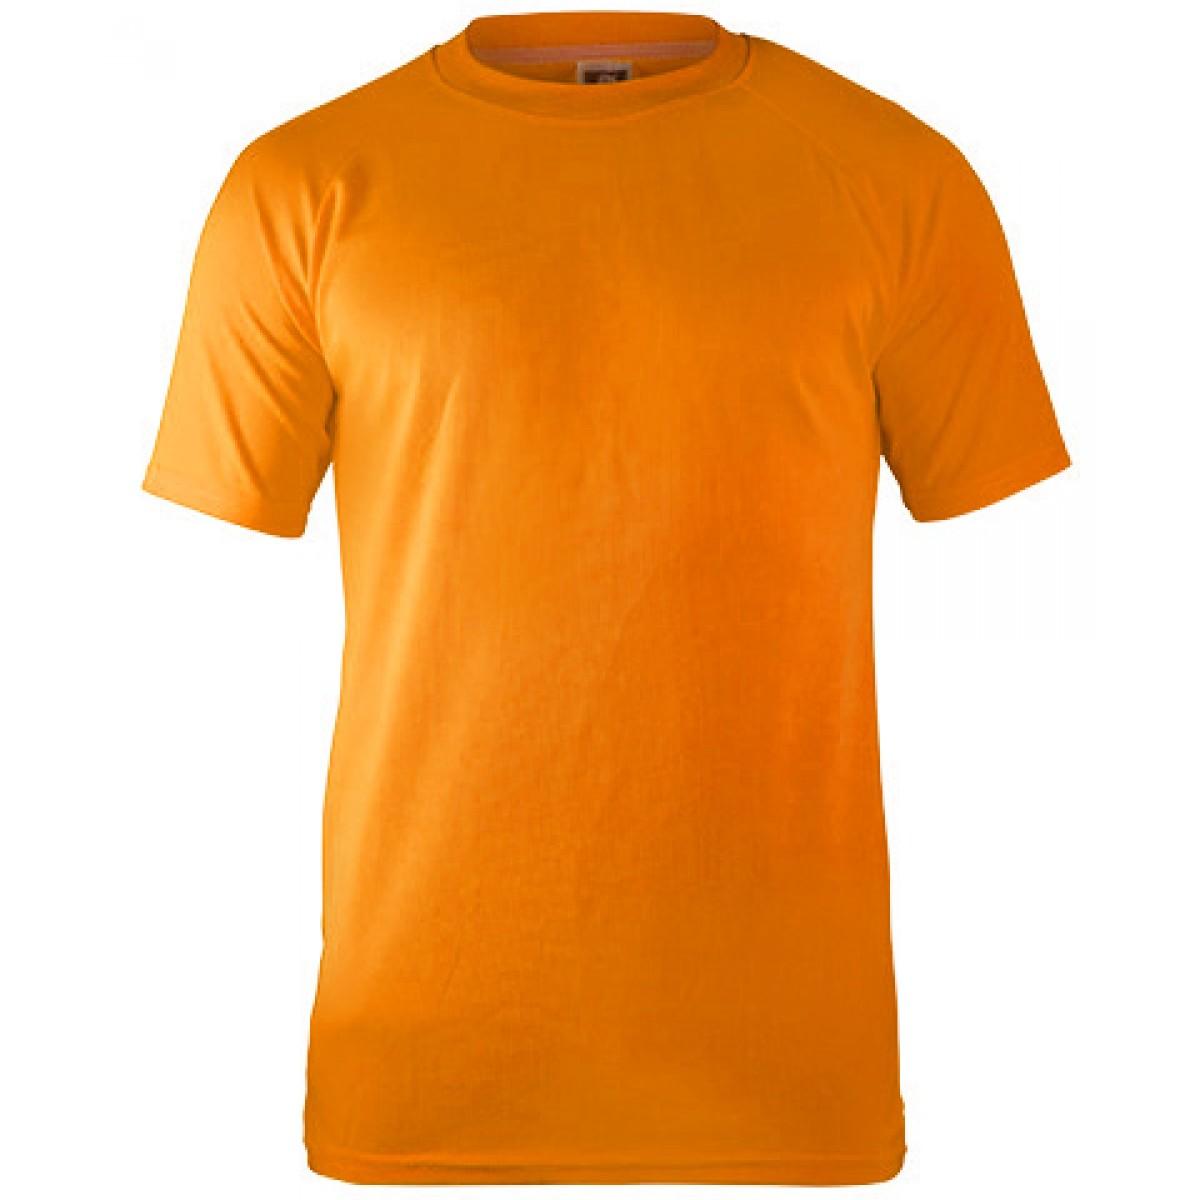 Short Sleeves Mesh Performance T-shirt-Safety Orange-YL